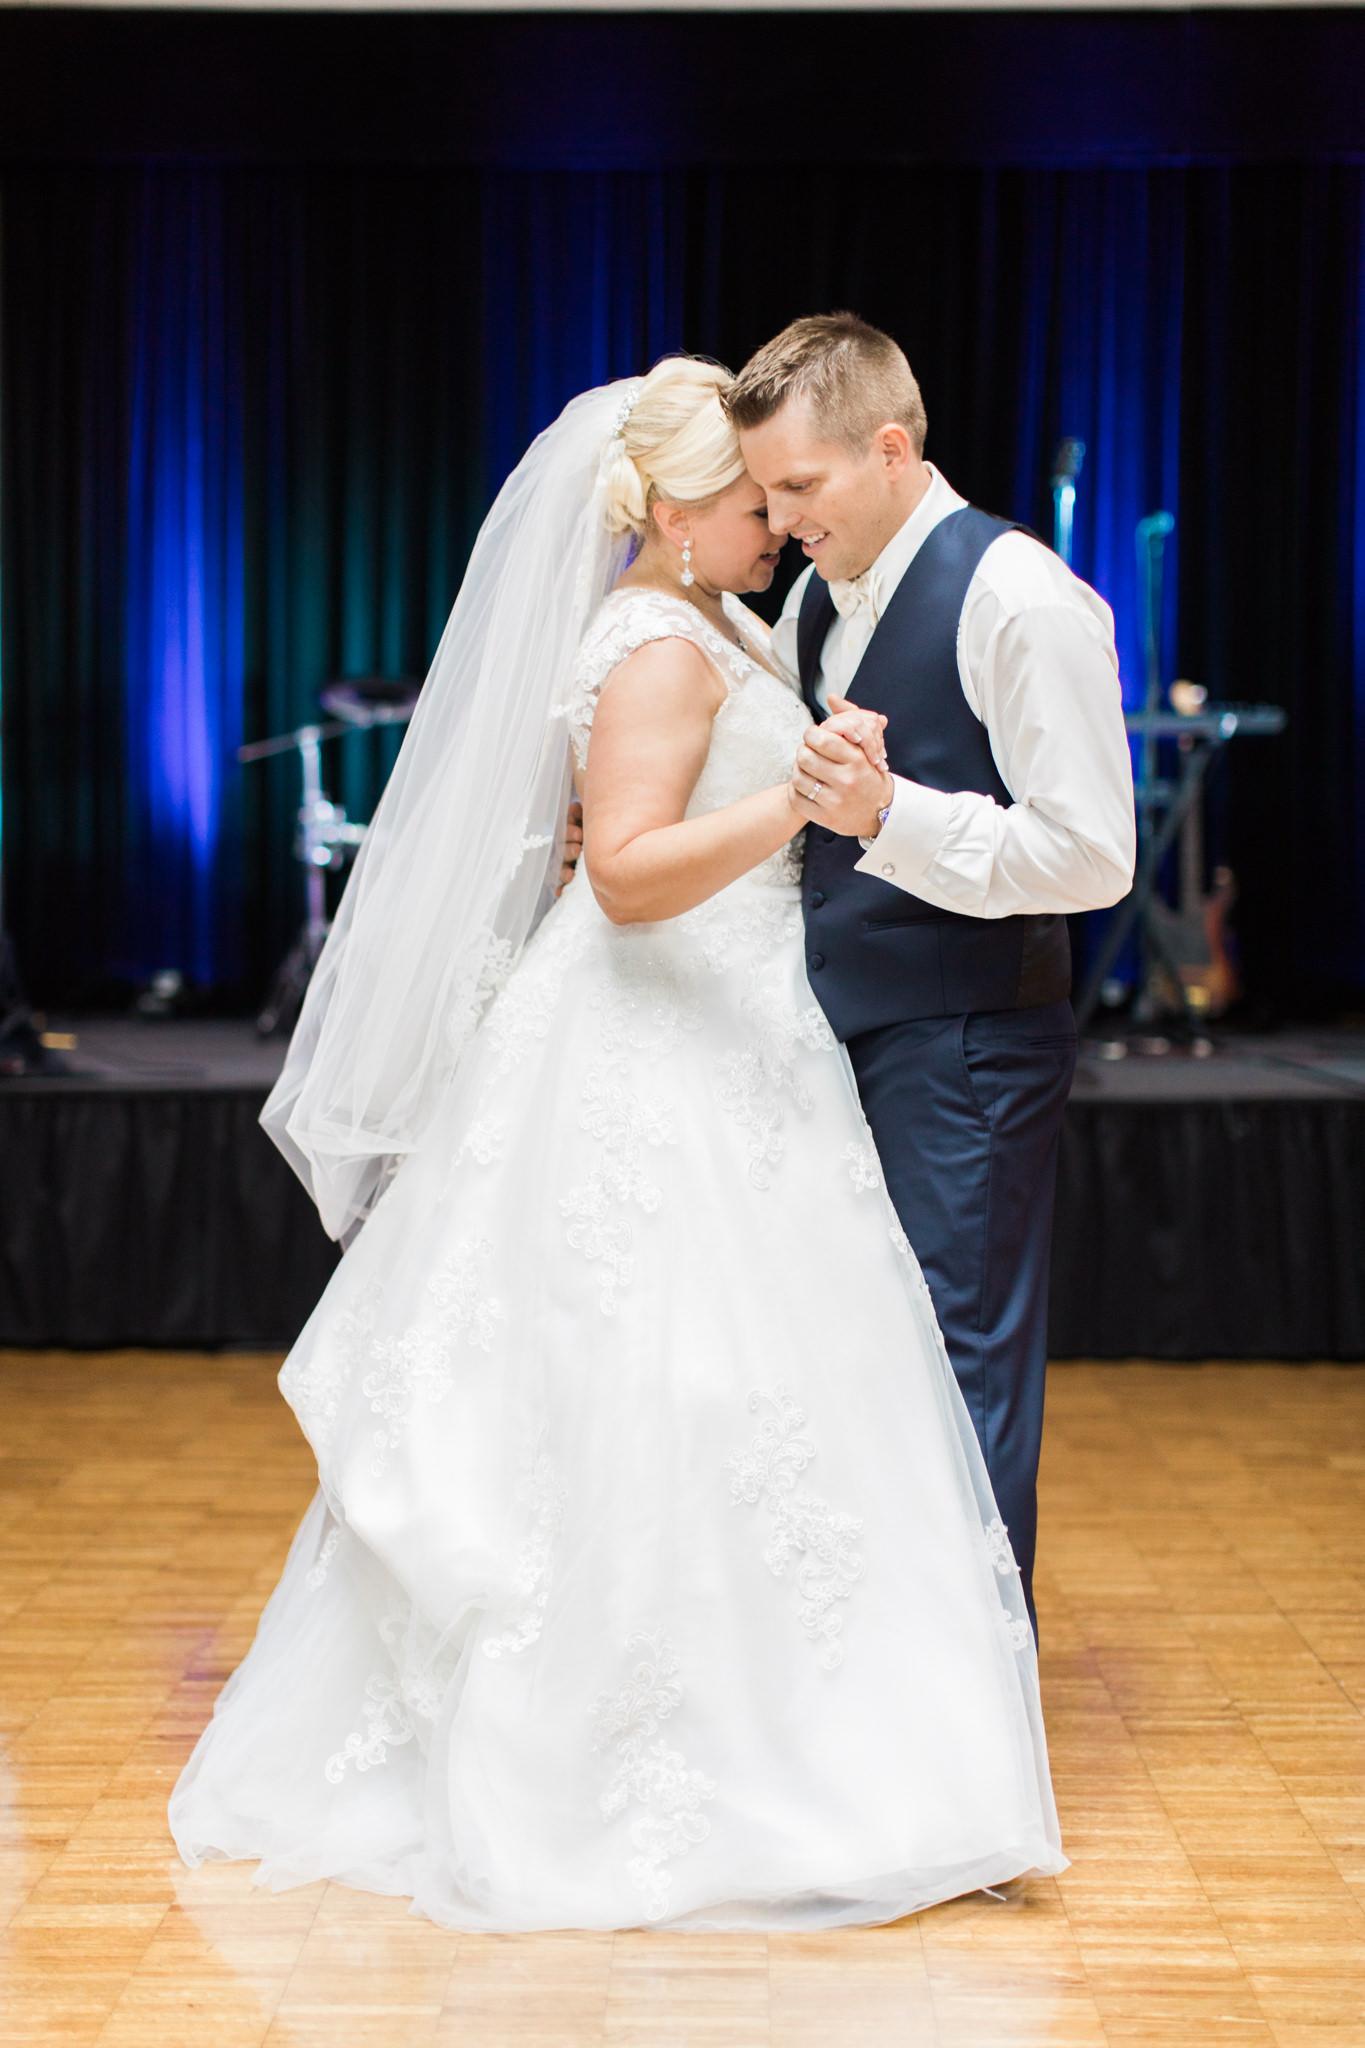 bride and groom first dance at Bellarmine University wedding in Louisville ky